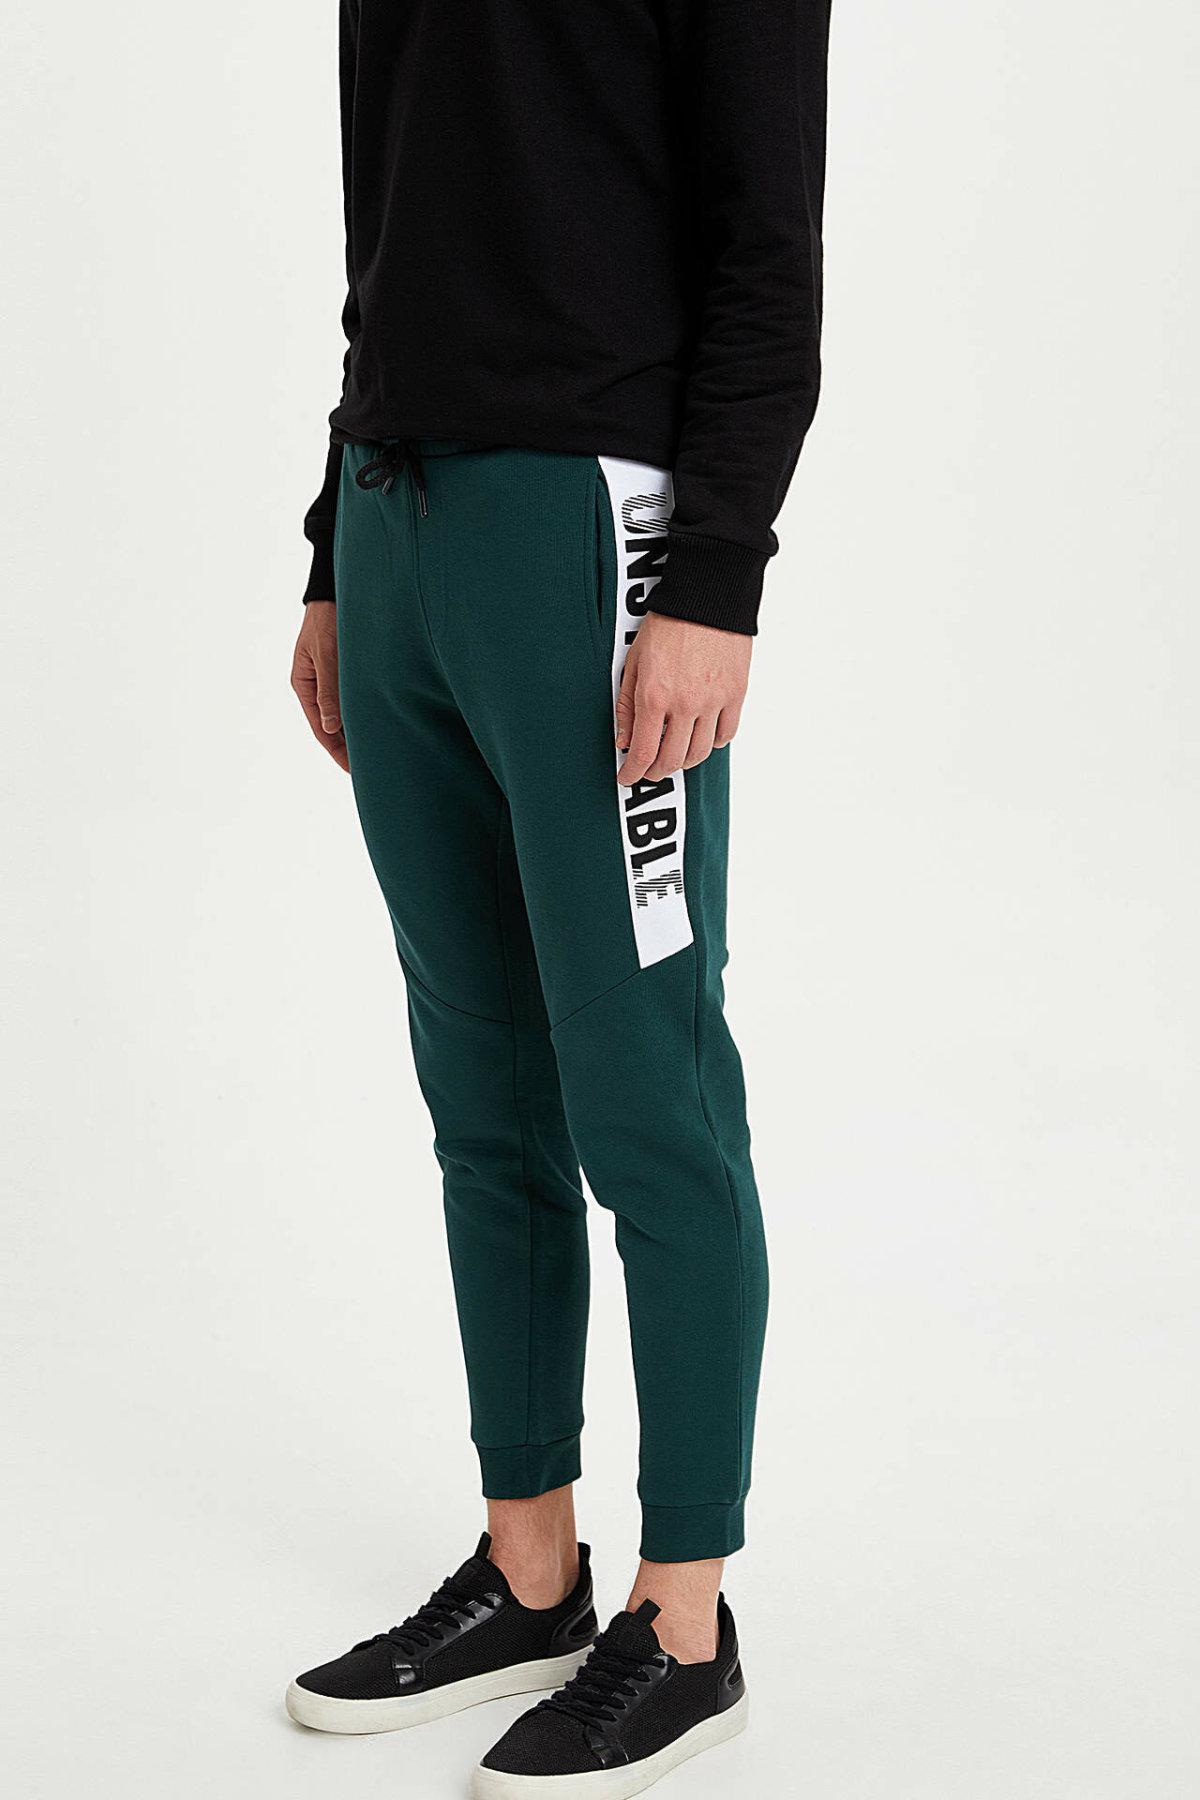 DeFacto Man Casual Drawstring Waist Trousers Letter Pattern Male Sport Long Pants For Men's High Quality Sweatpant - L1810AZ19WN